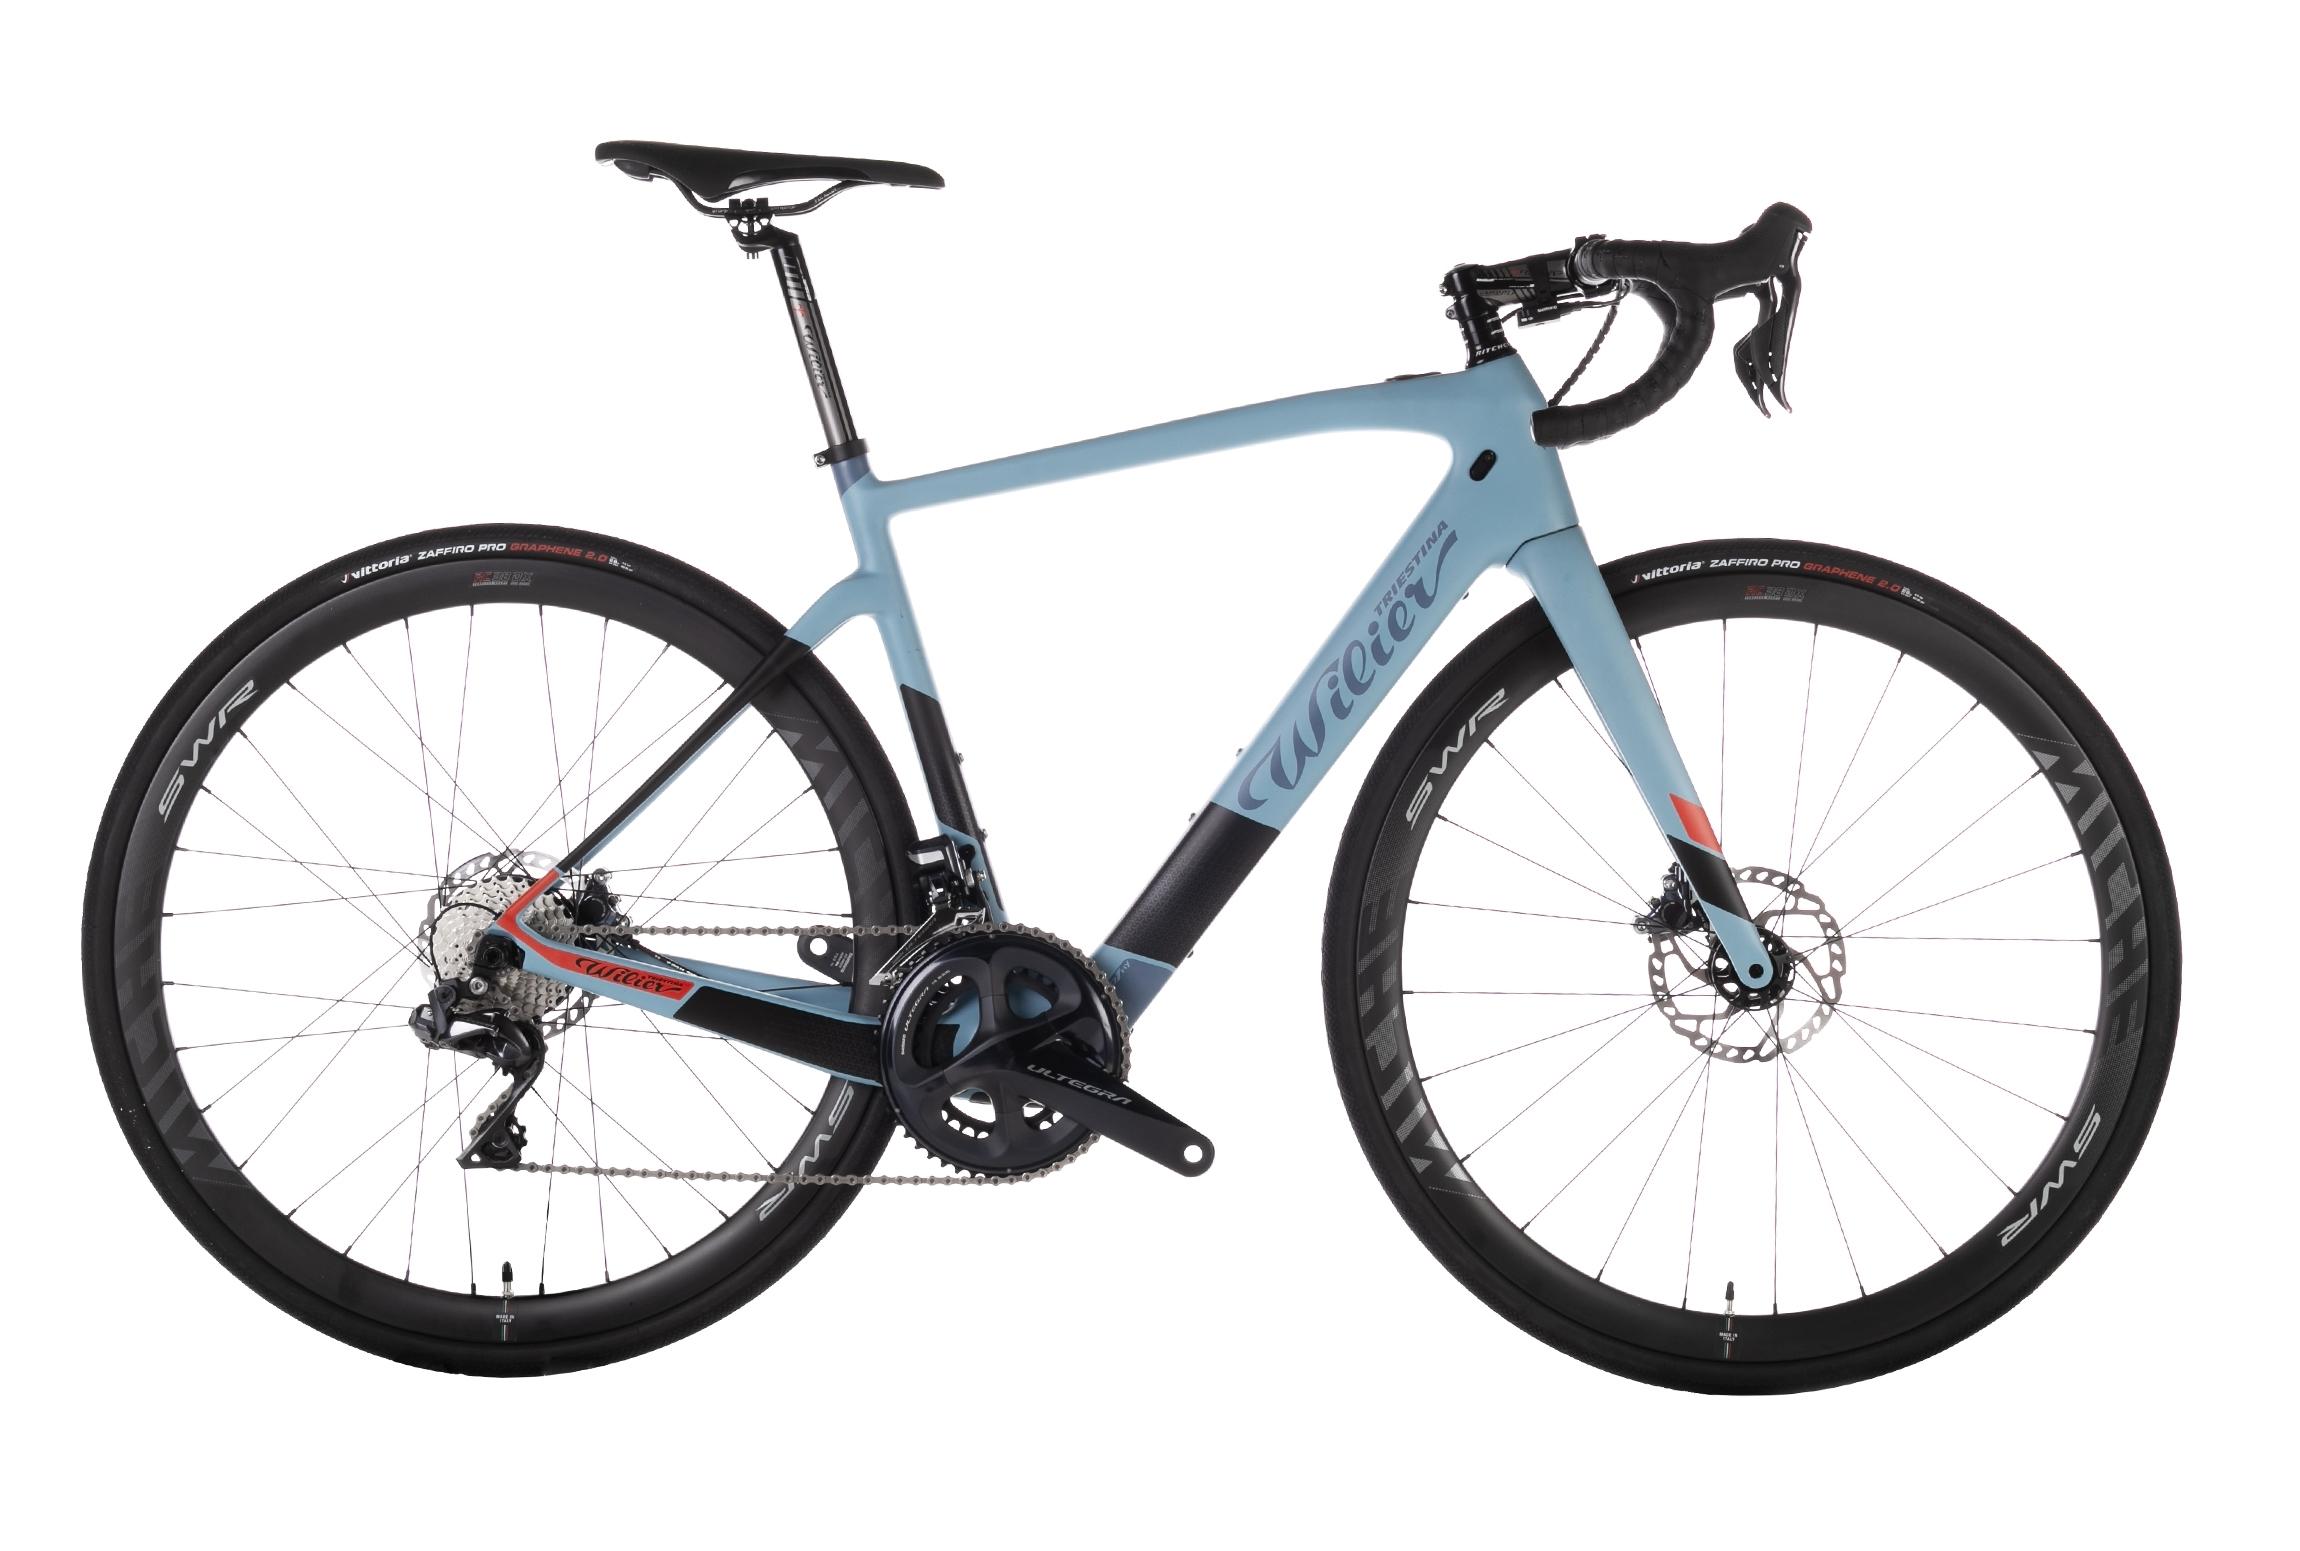 kolo CENTO1HY+ULTEGRA Di2 8070+REVOX blue black  M